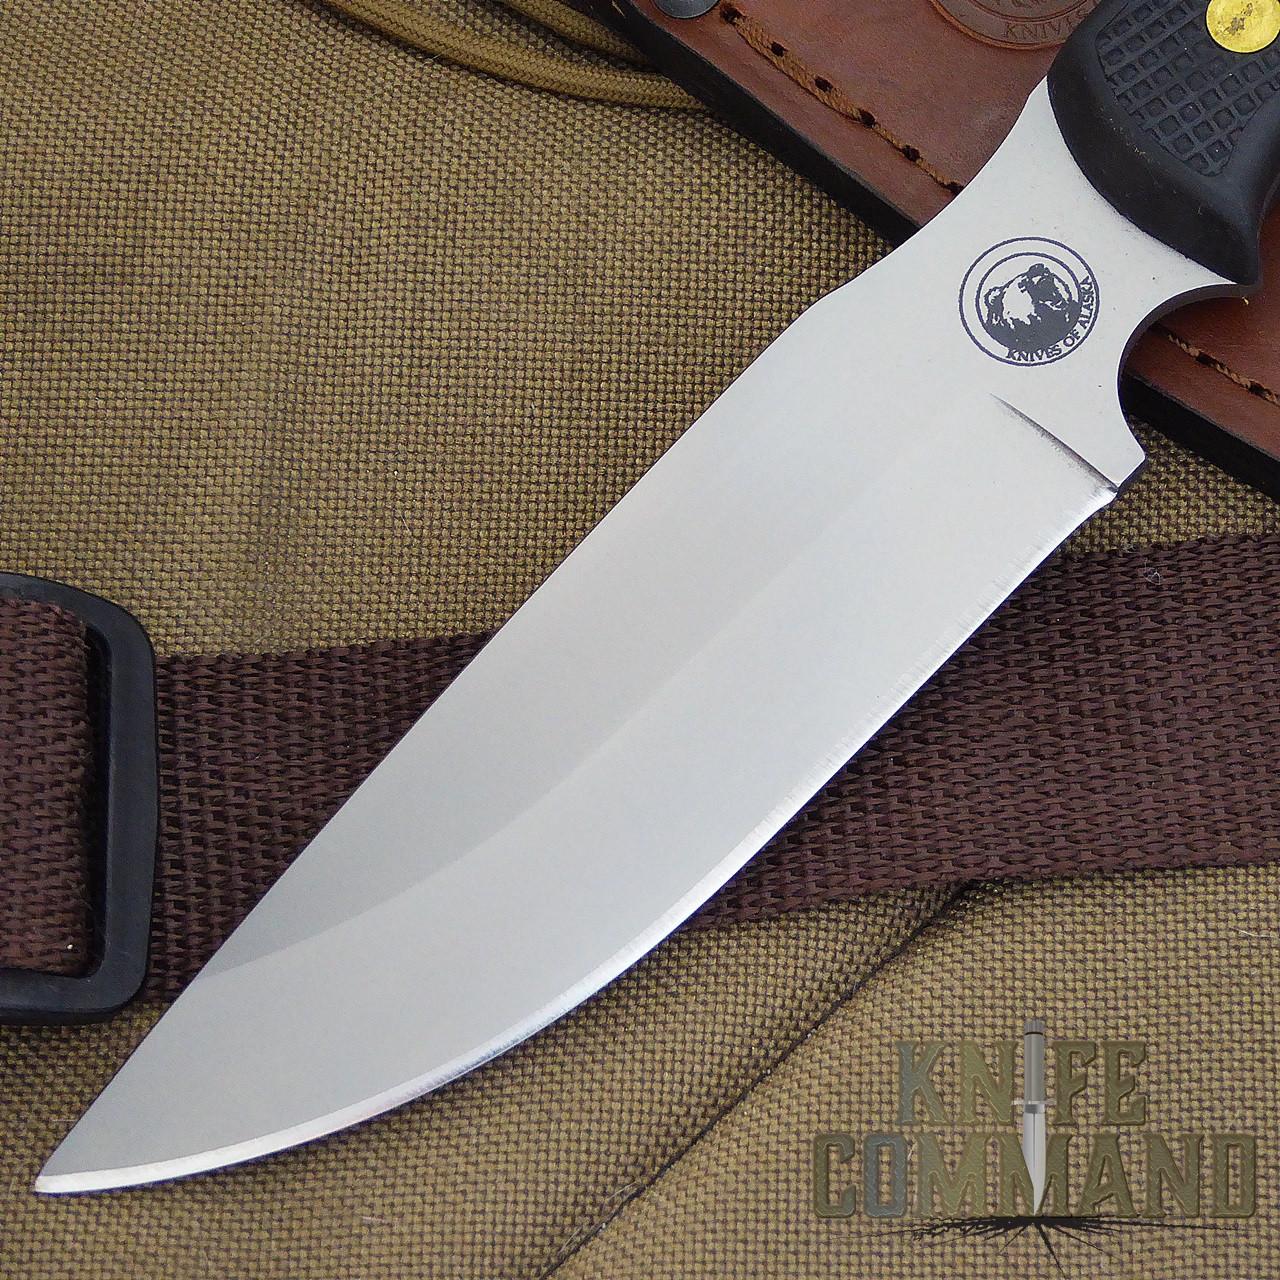 Knives of Alaska Bush Camp Hunting Knife.  D2 steel blade.